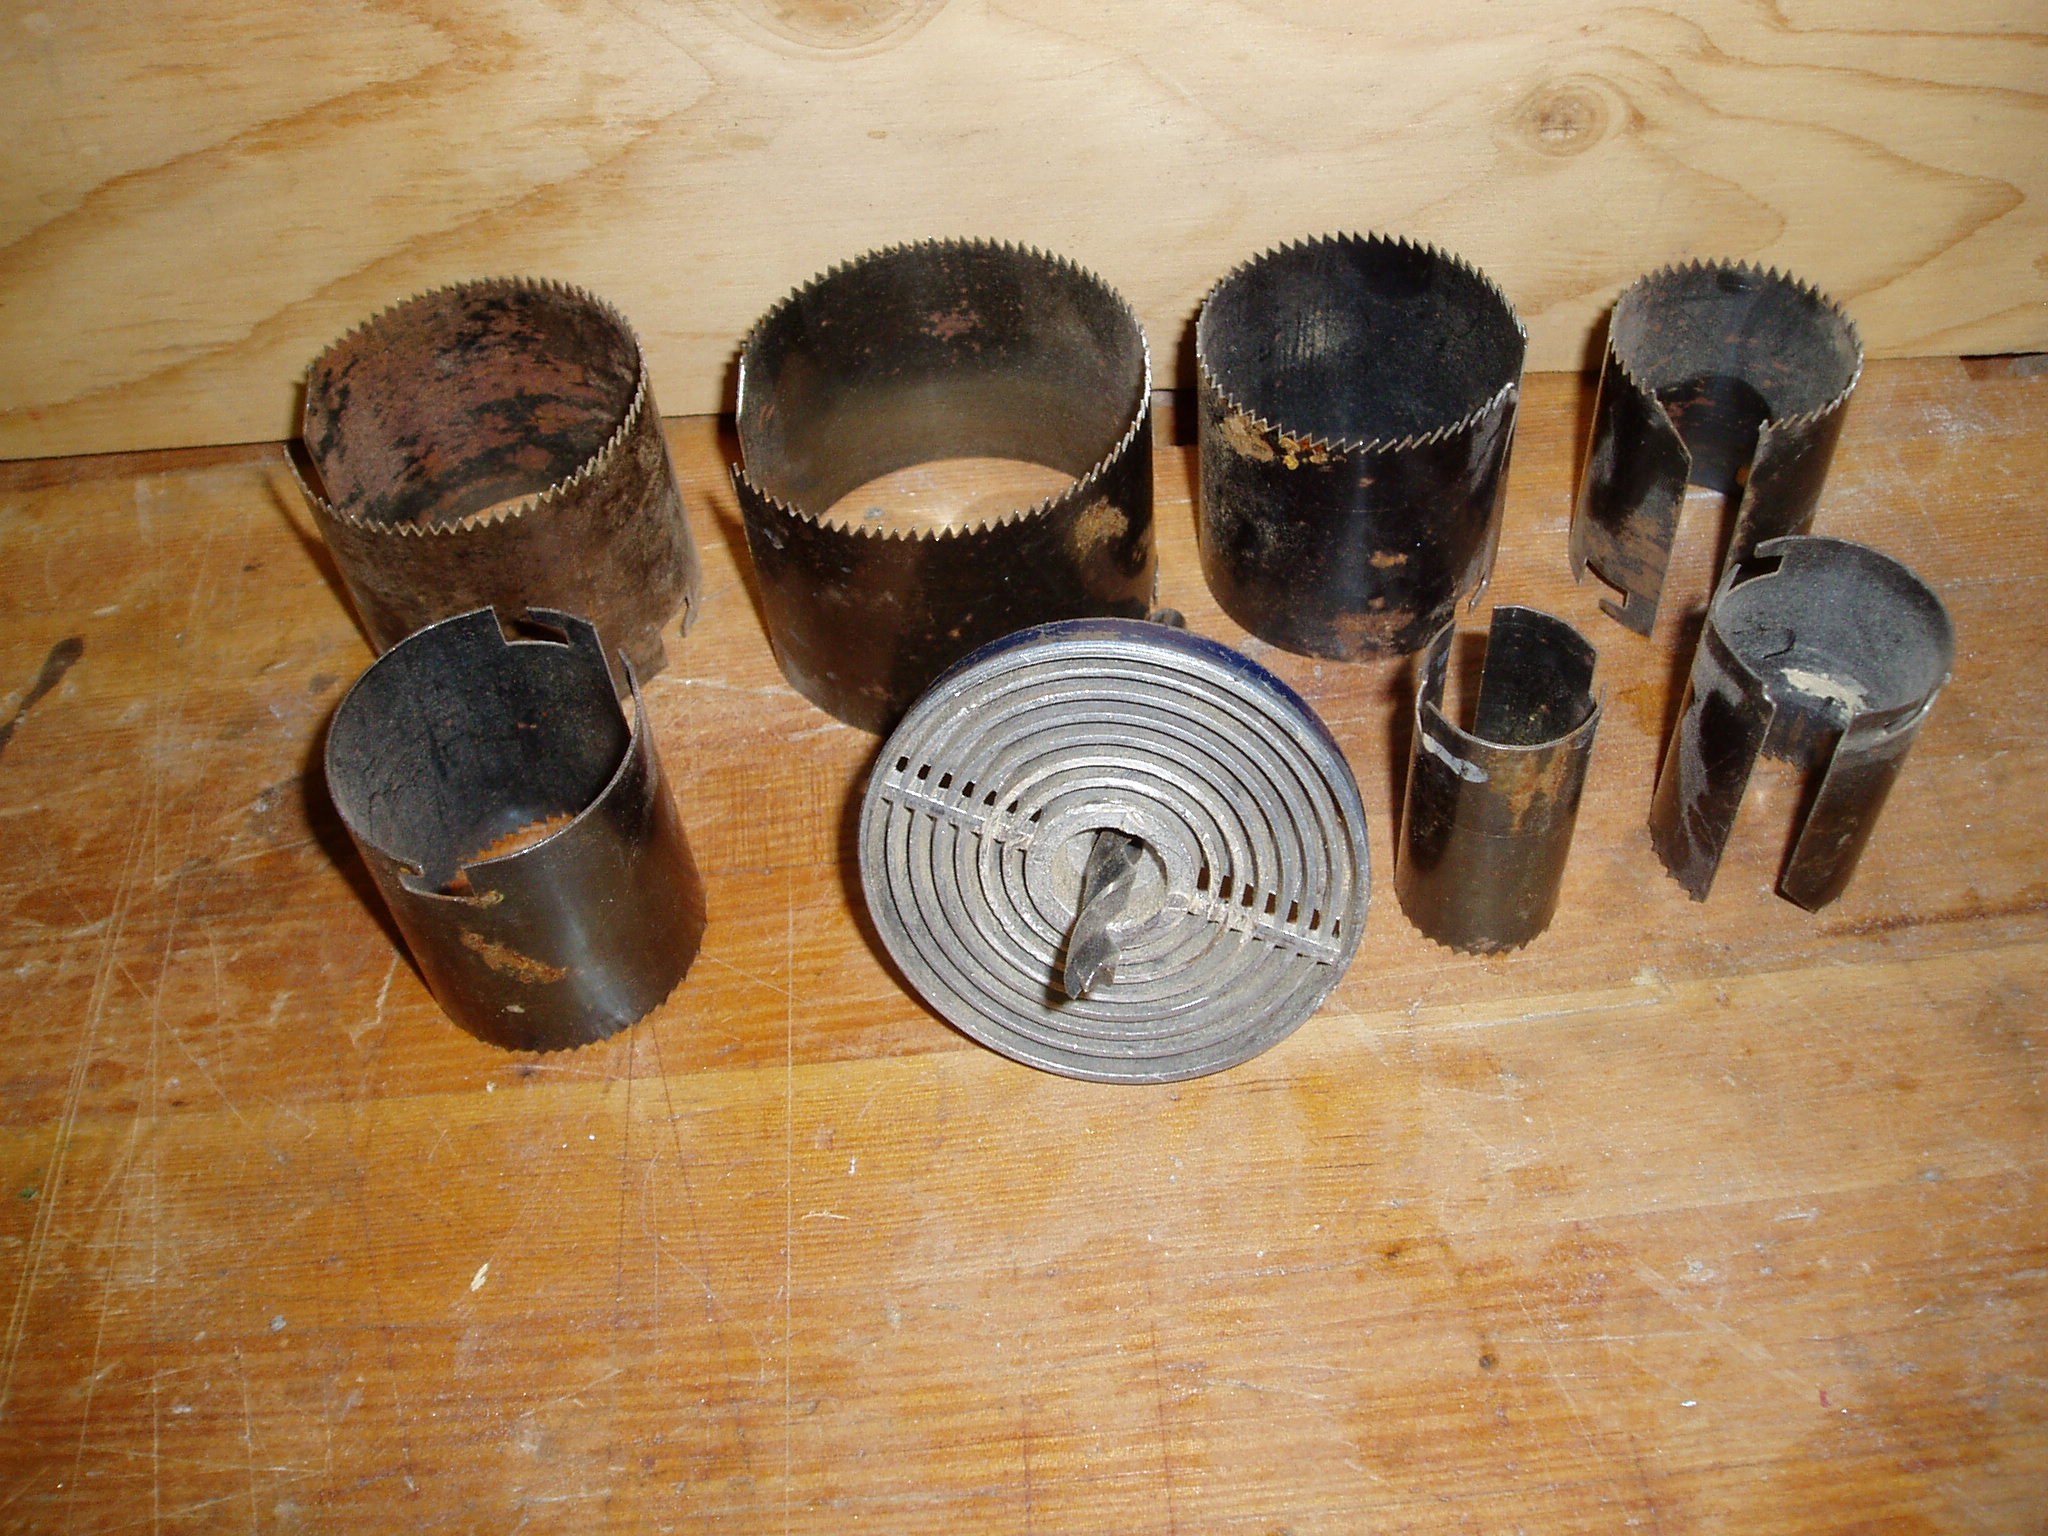 File:Adjustable hole saw.JPG - Wikimedia Commons